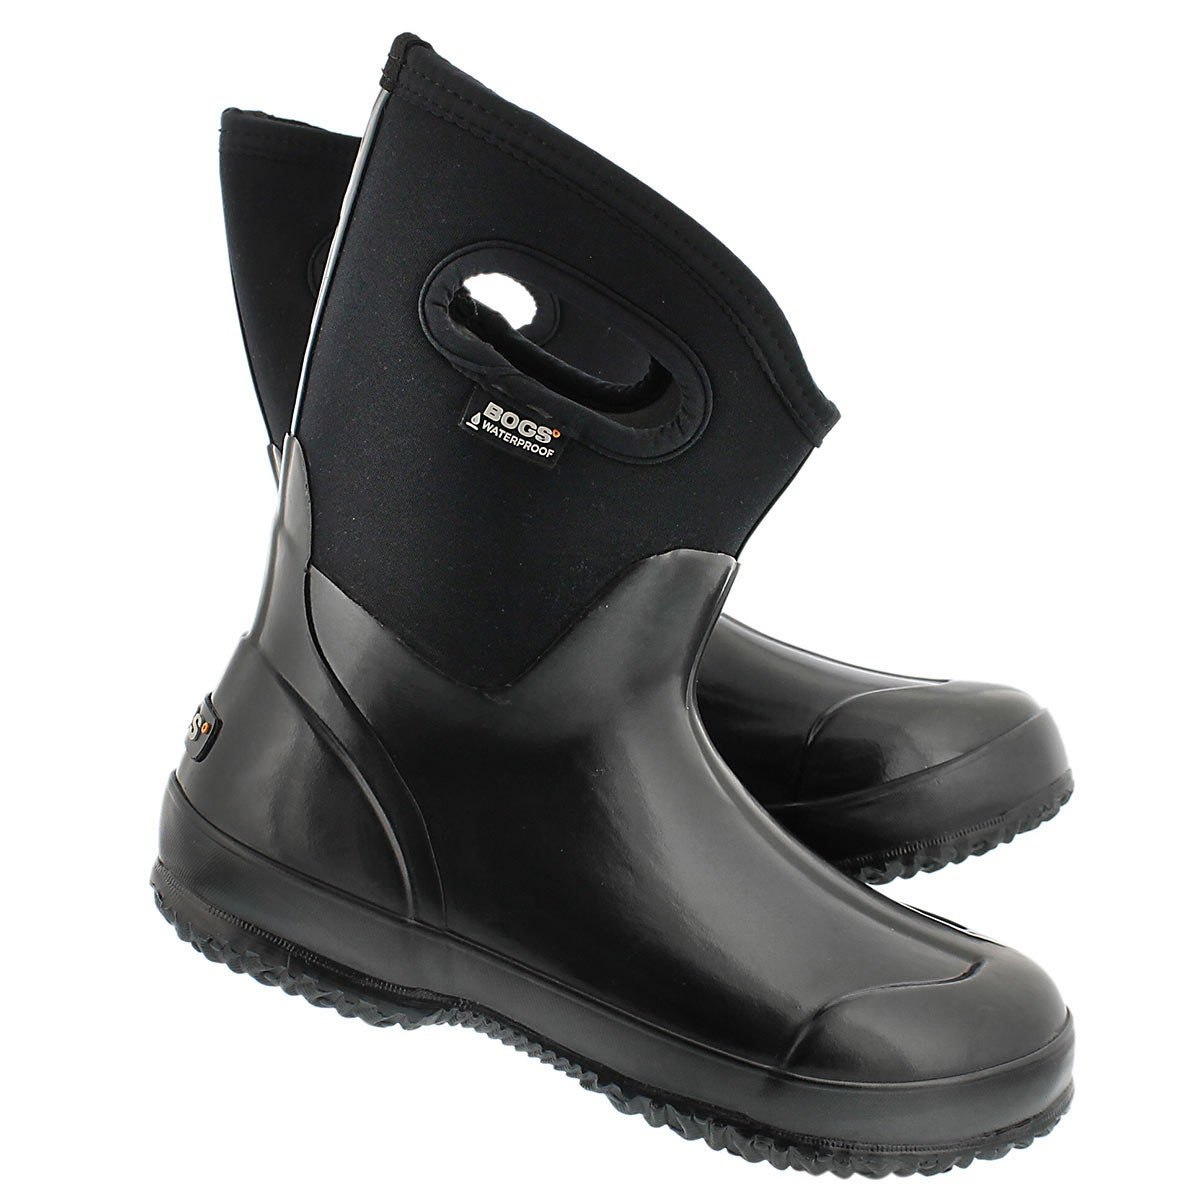 Lds Classic Mid black shiny wtpf boot